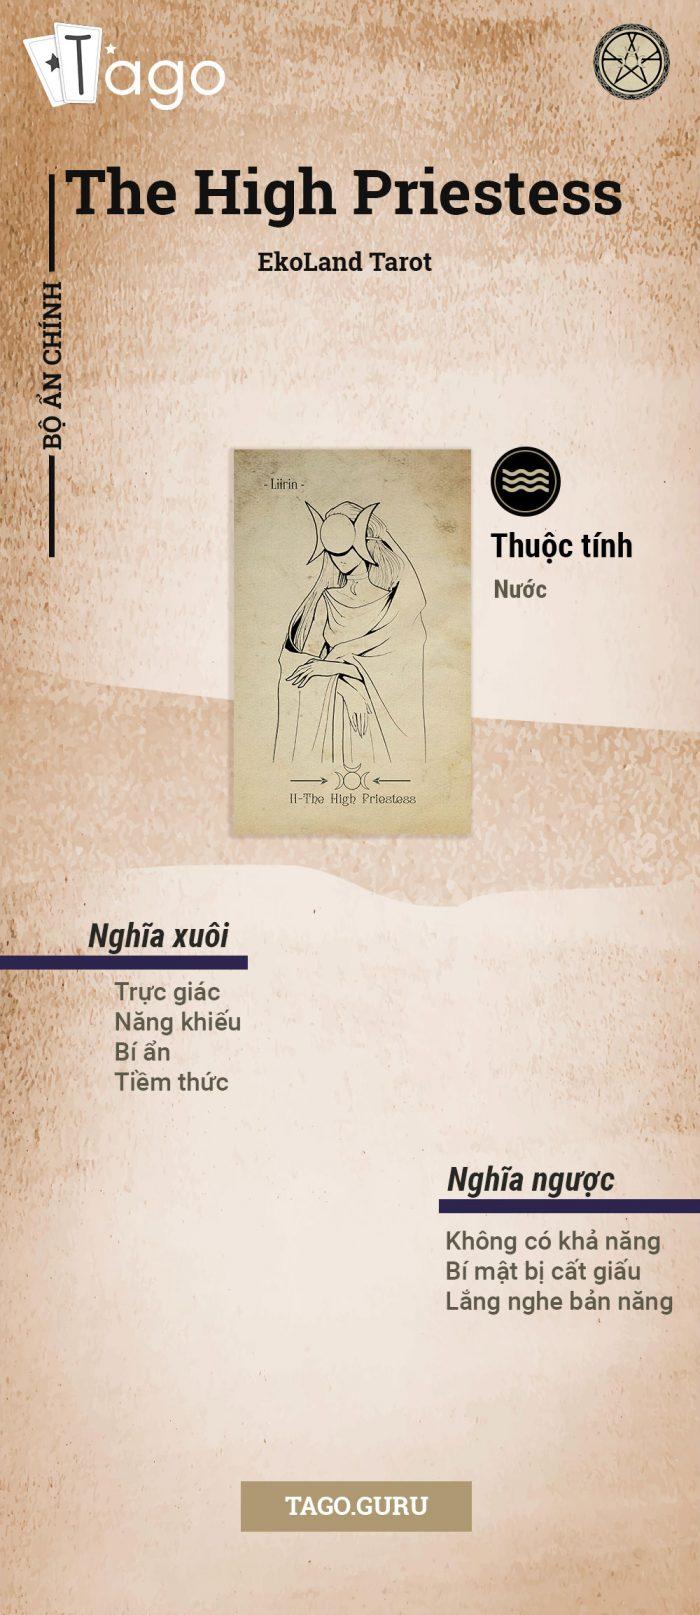 TAGO-Cheat-Sheet-The-High-Priestess